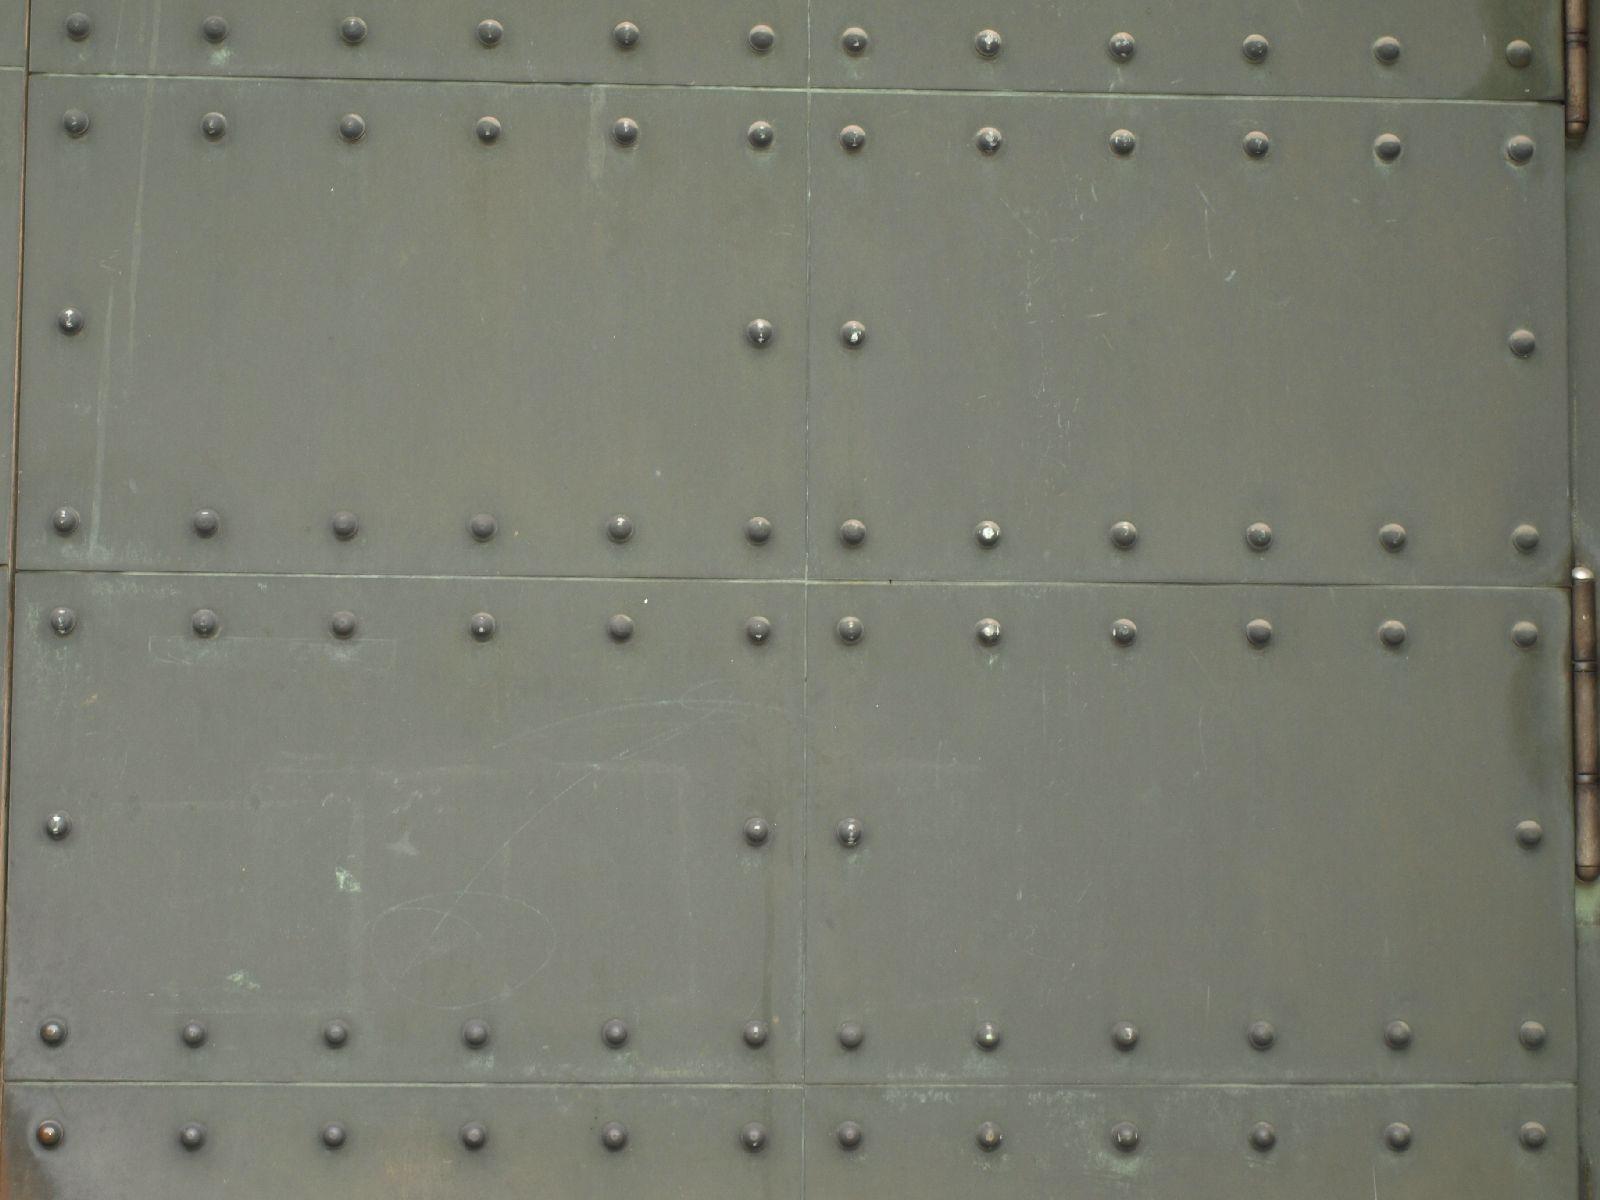 Metall_Textur_A_P4090272